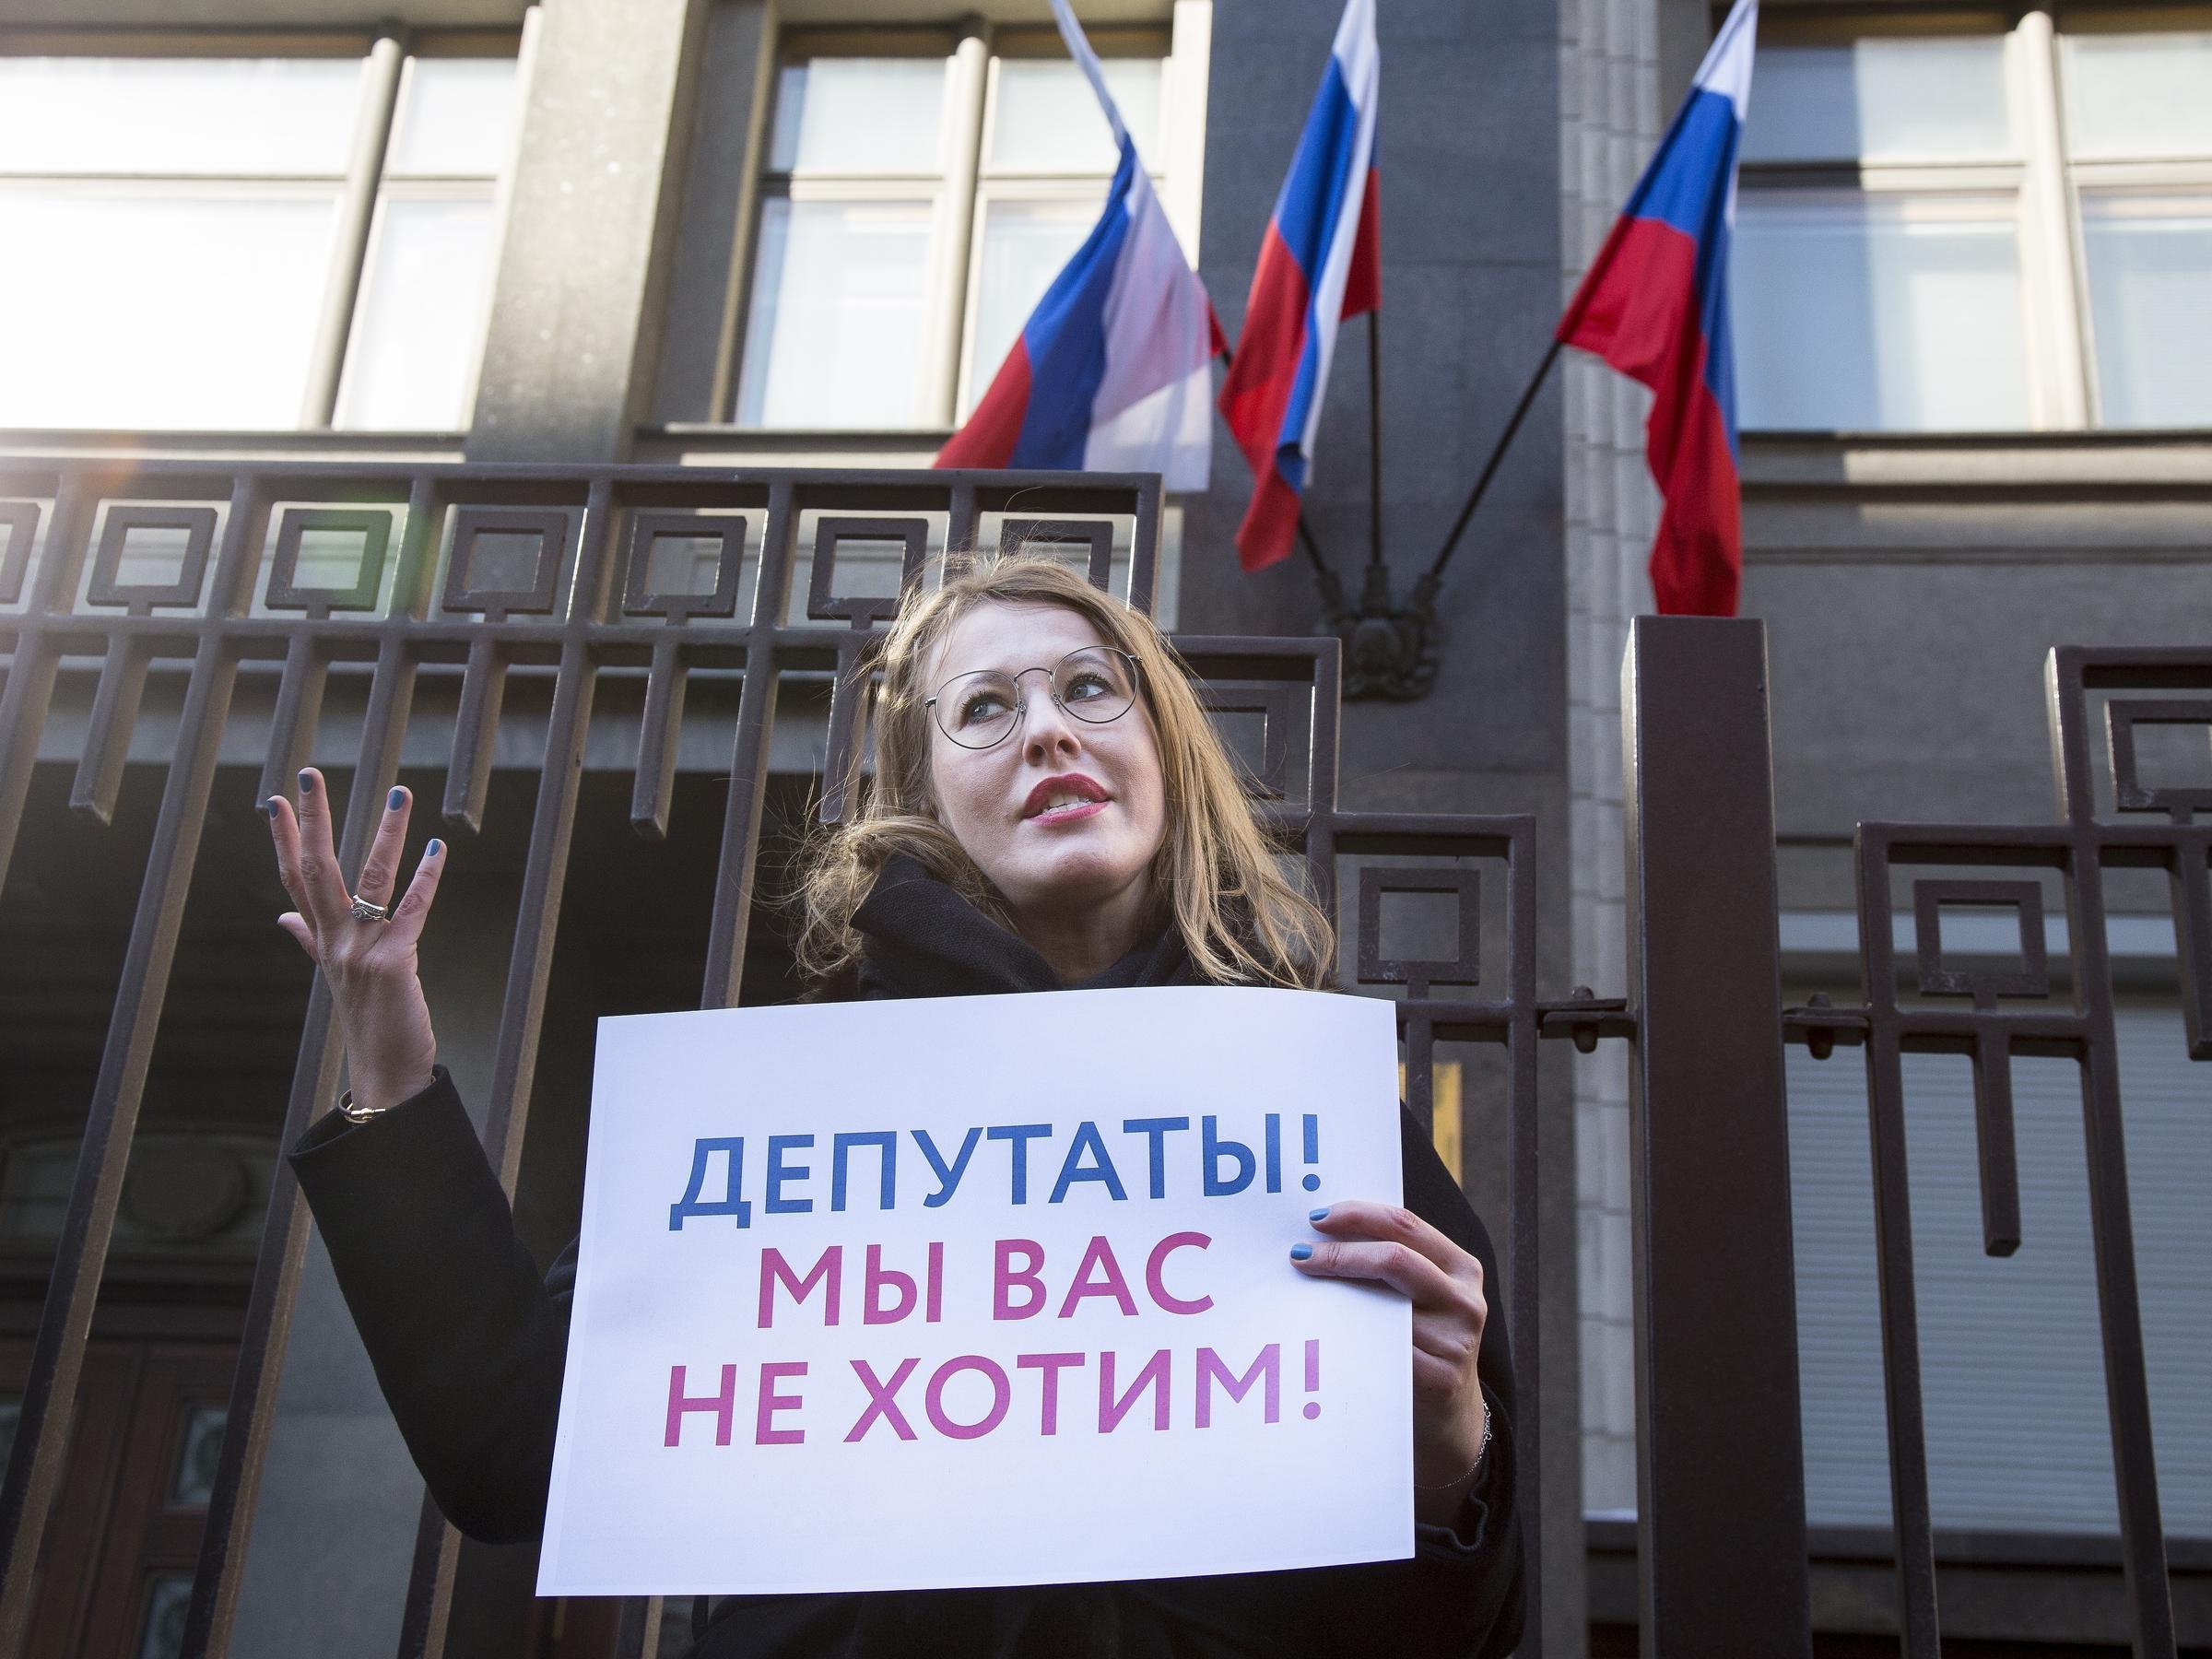 Ksenia Sobchak announced the sex contest 13.09.2012 92